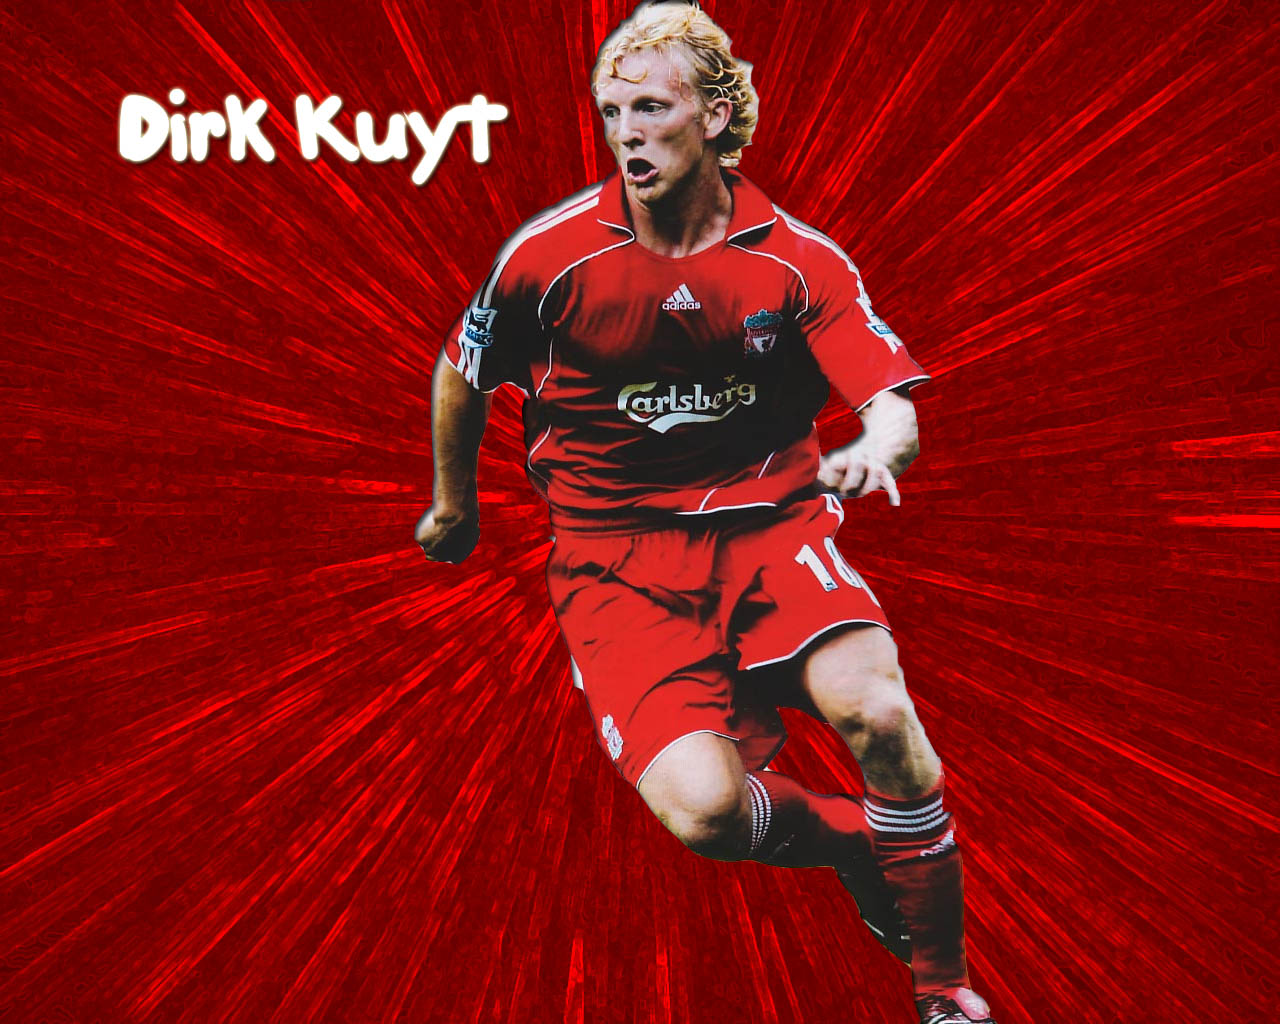 http://1.bp.blogspot.com/_2j5Y6SnqQOs/TJkGqpd7sXI/AAAAAAAAA68/33nJaHOgfM4/s1600/Dirk+Kuyt+Wallpaper-31.jpg